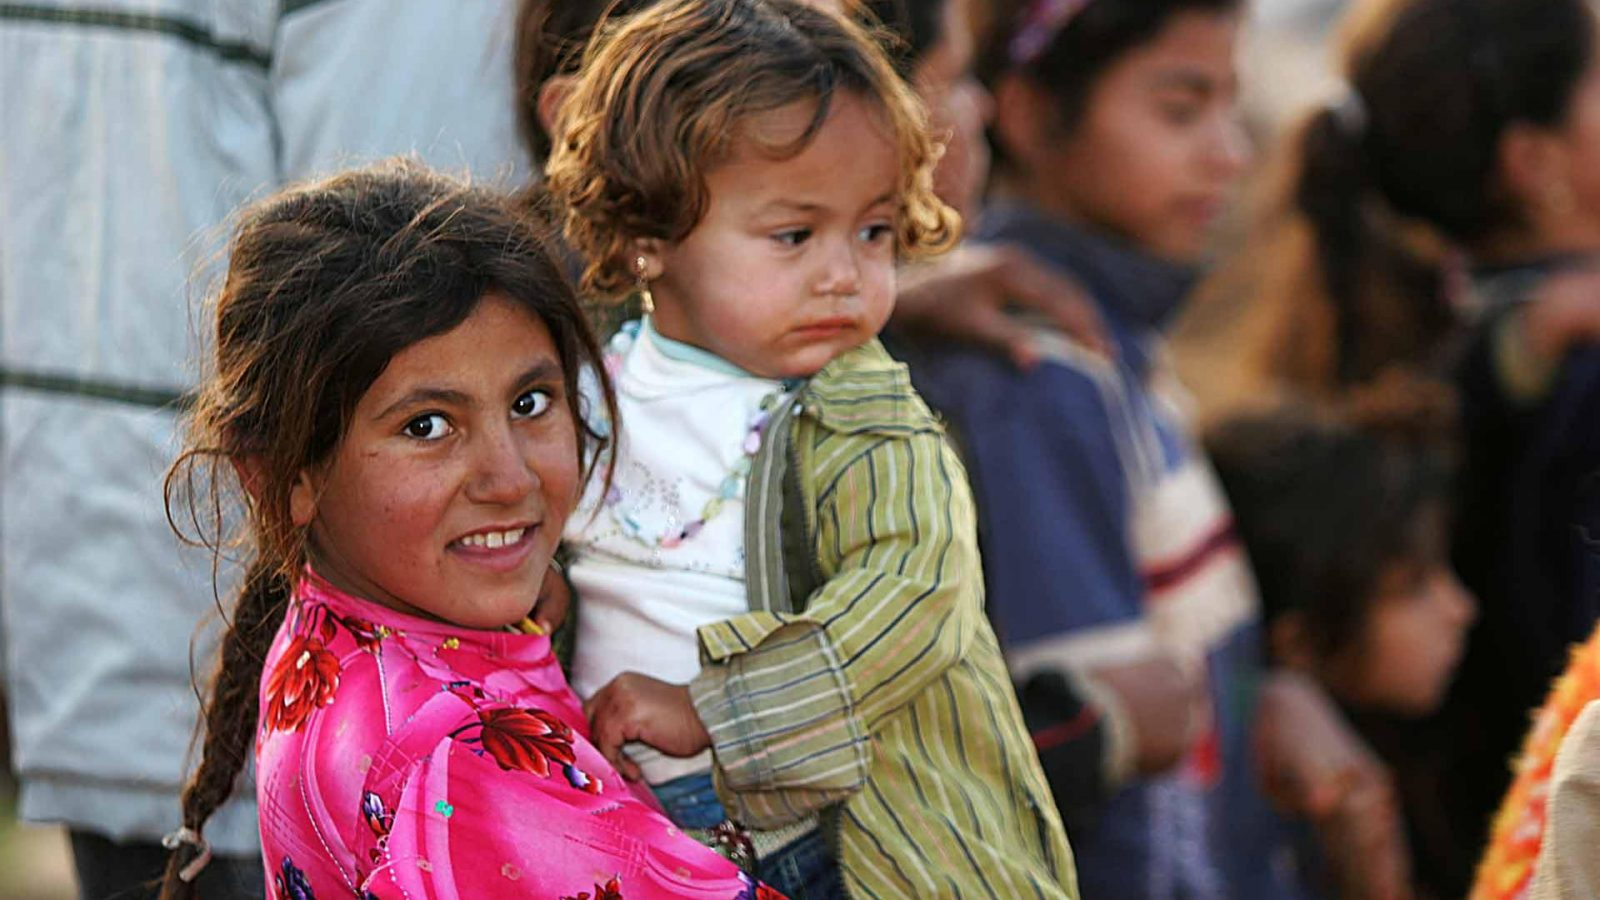 Young Iraqi refugee holding a young Iraqi refugee